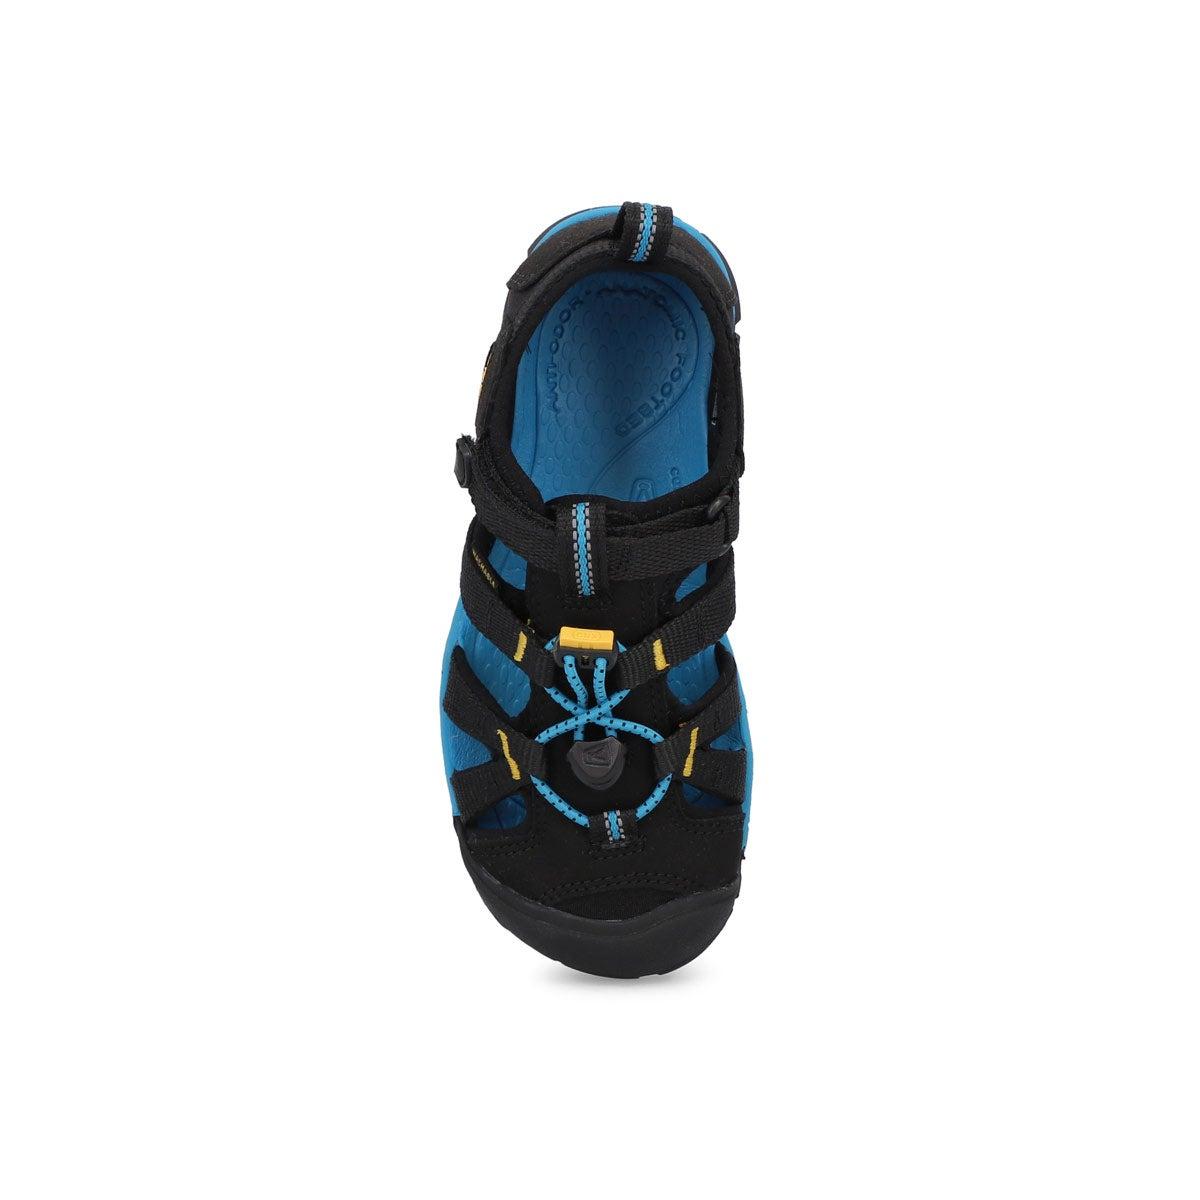 Infants' Seacamp II CNX Sport Sandal- Black/Yellow